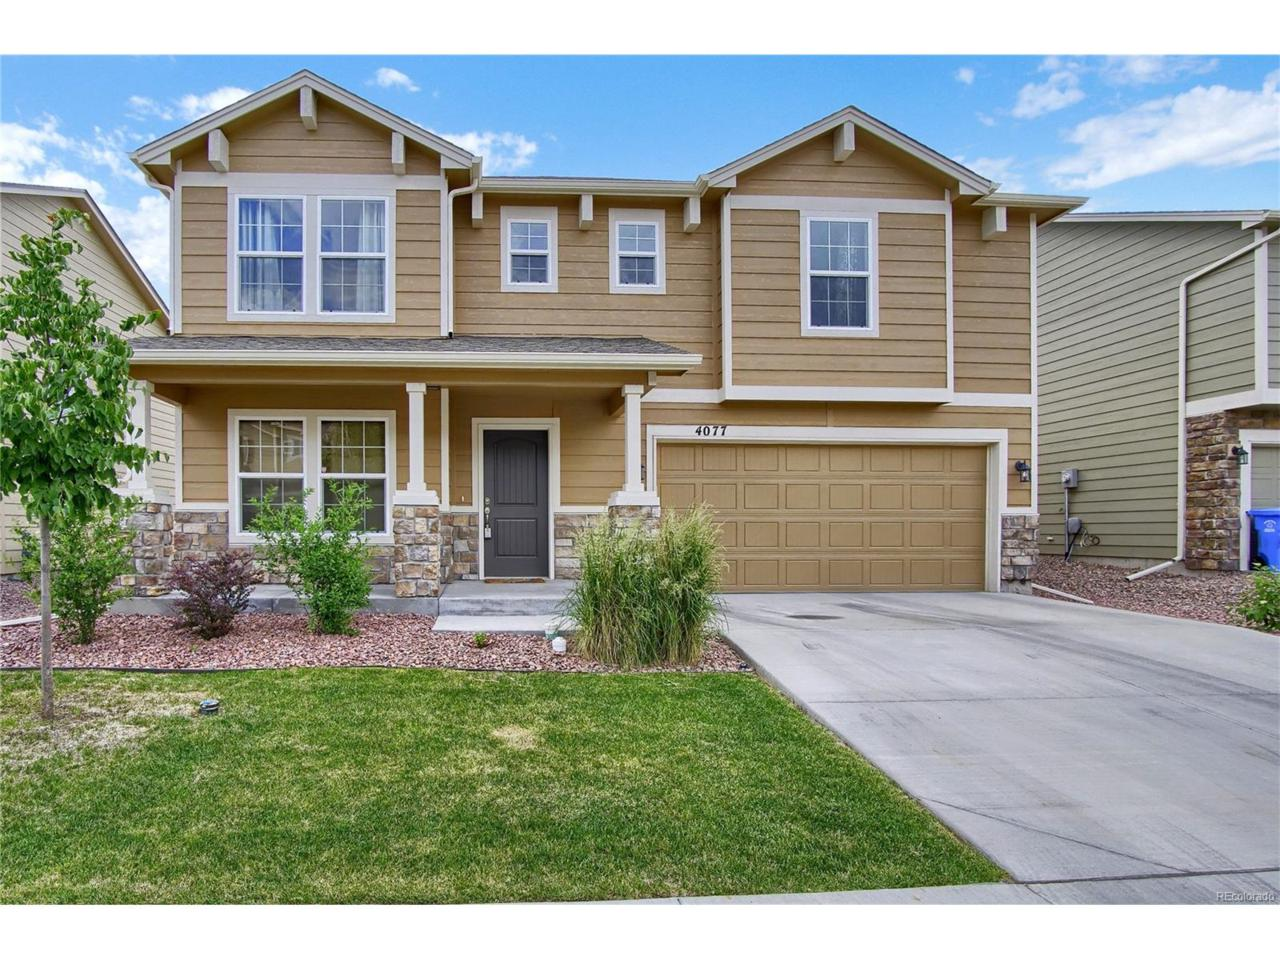 4077 Creek Legend View, Colorado Springs, CO 80911 (MLS #9226577) :: 8z Real Estate